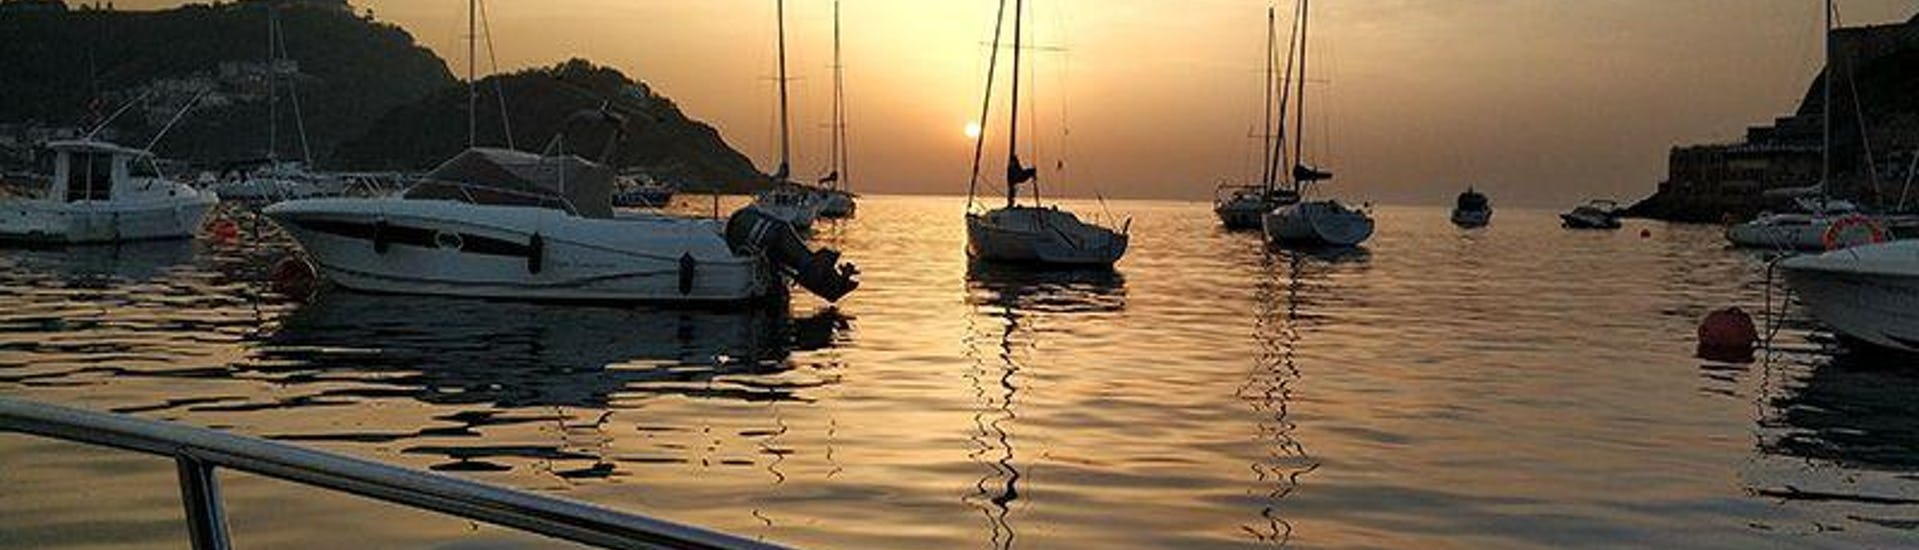 Private Boat Tour at Sunset in San Sebastián